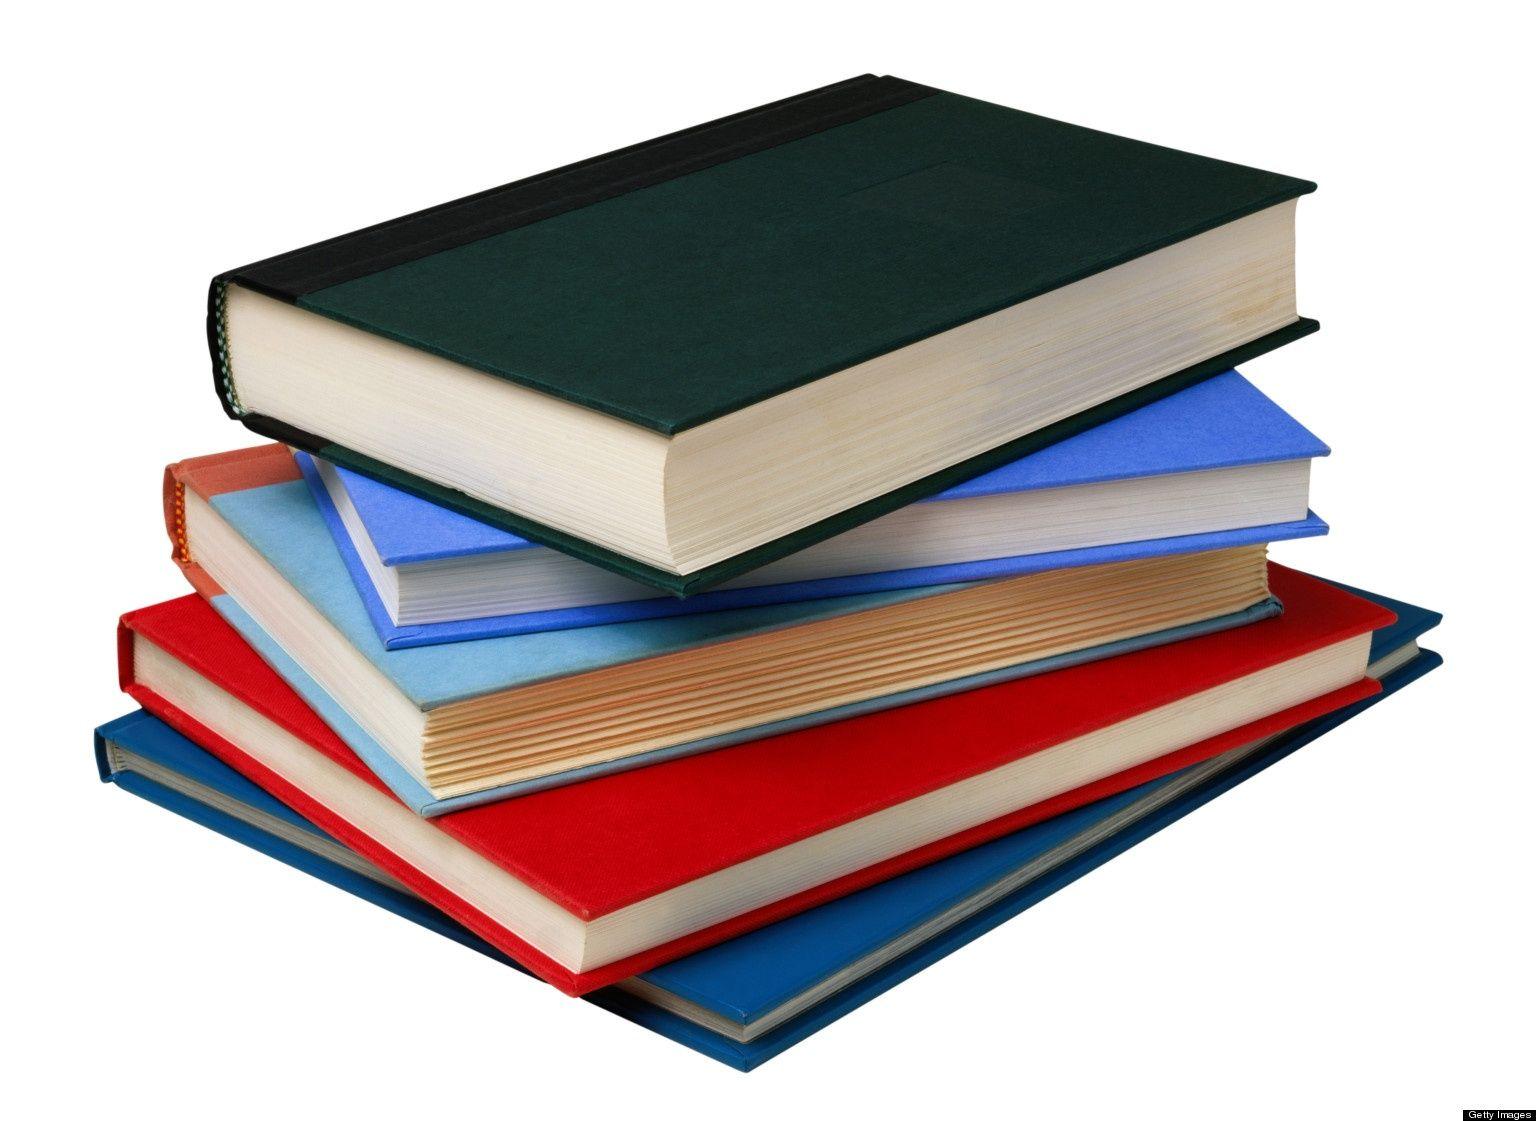 Lehninger principles of biochemistry 7th edition pdf ebook lehninger principles of biochemistry 7th edition pdf ebook instant download fandeluxe Gallery